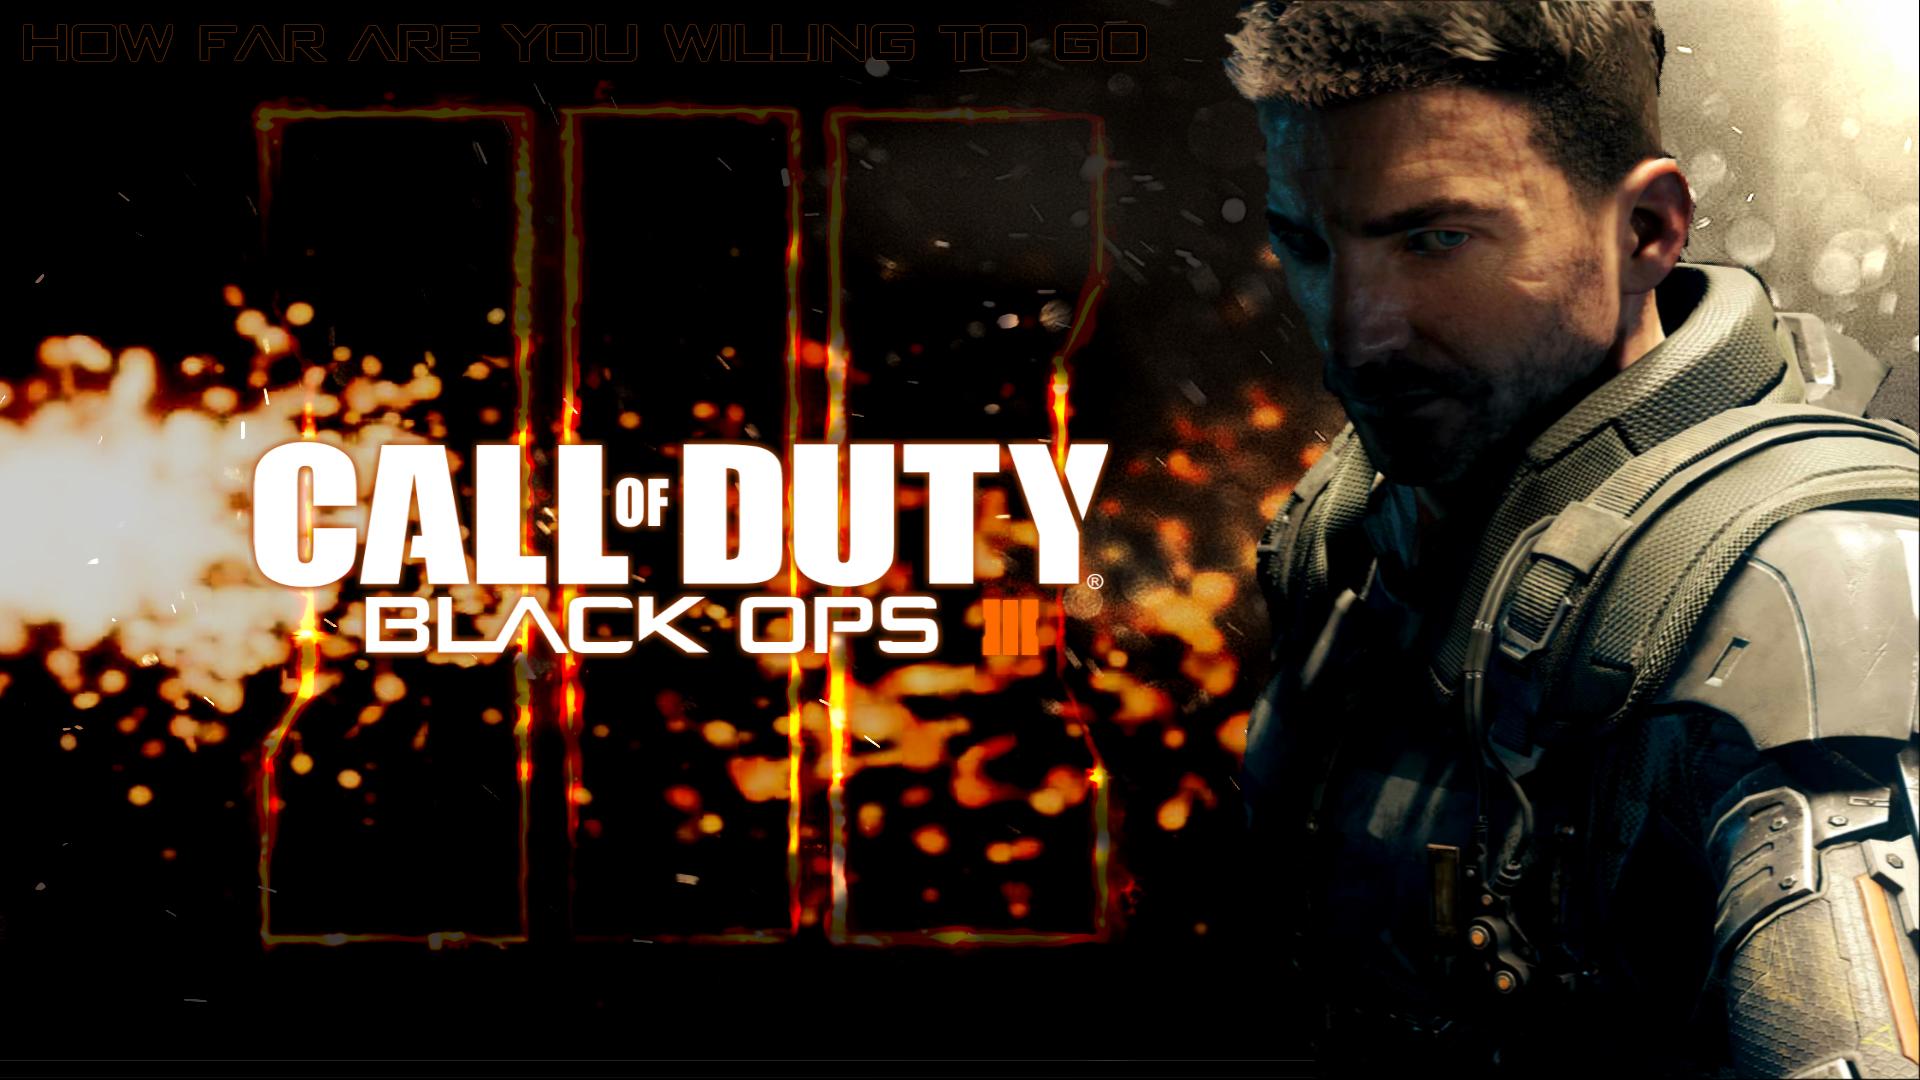 call of duty black ops iii wallpaper